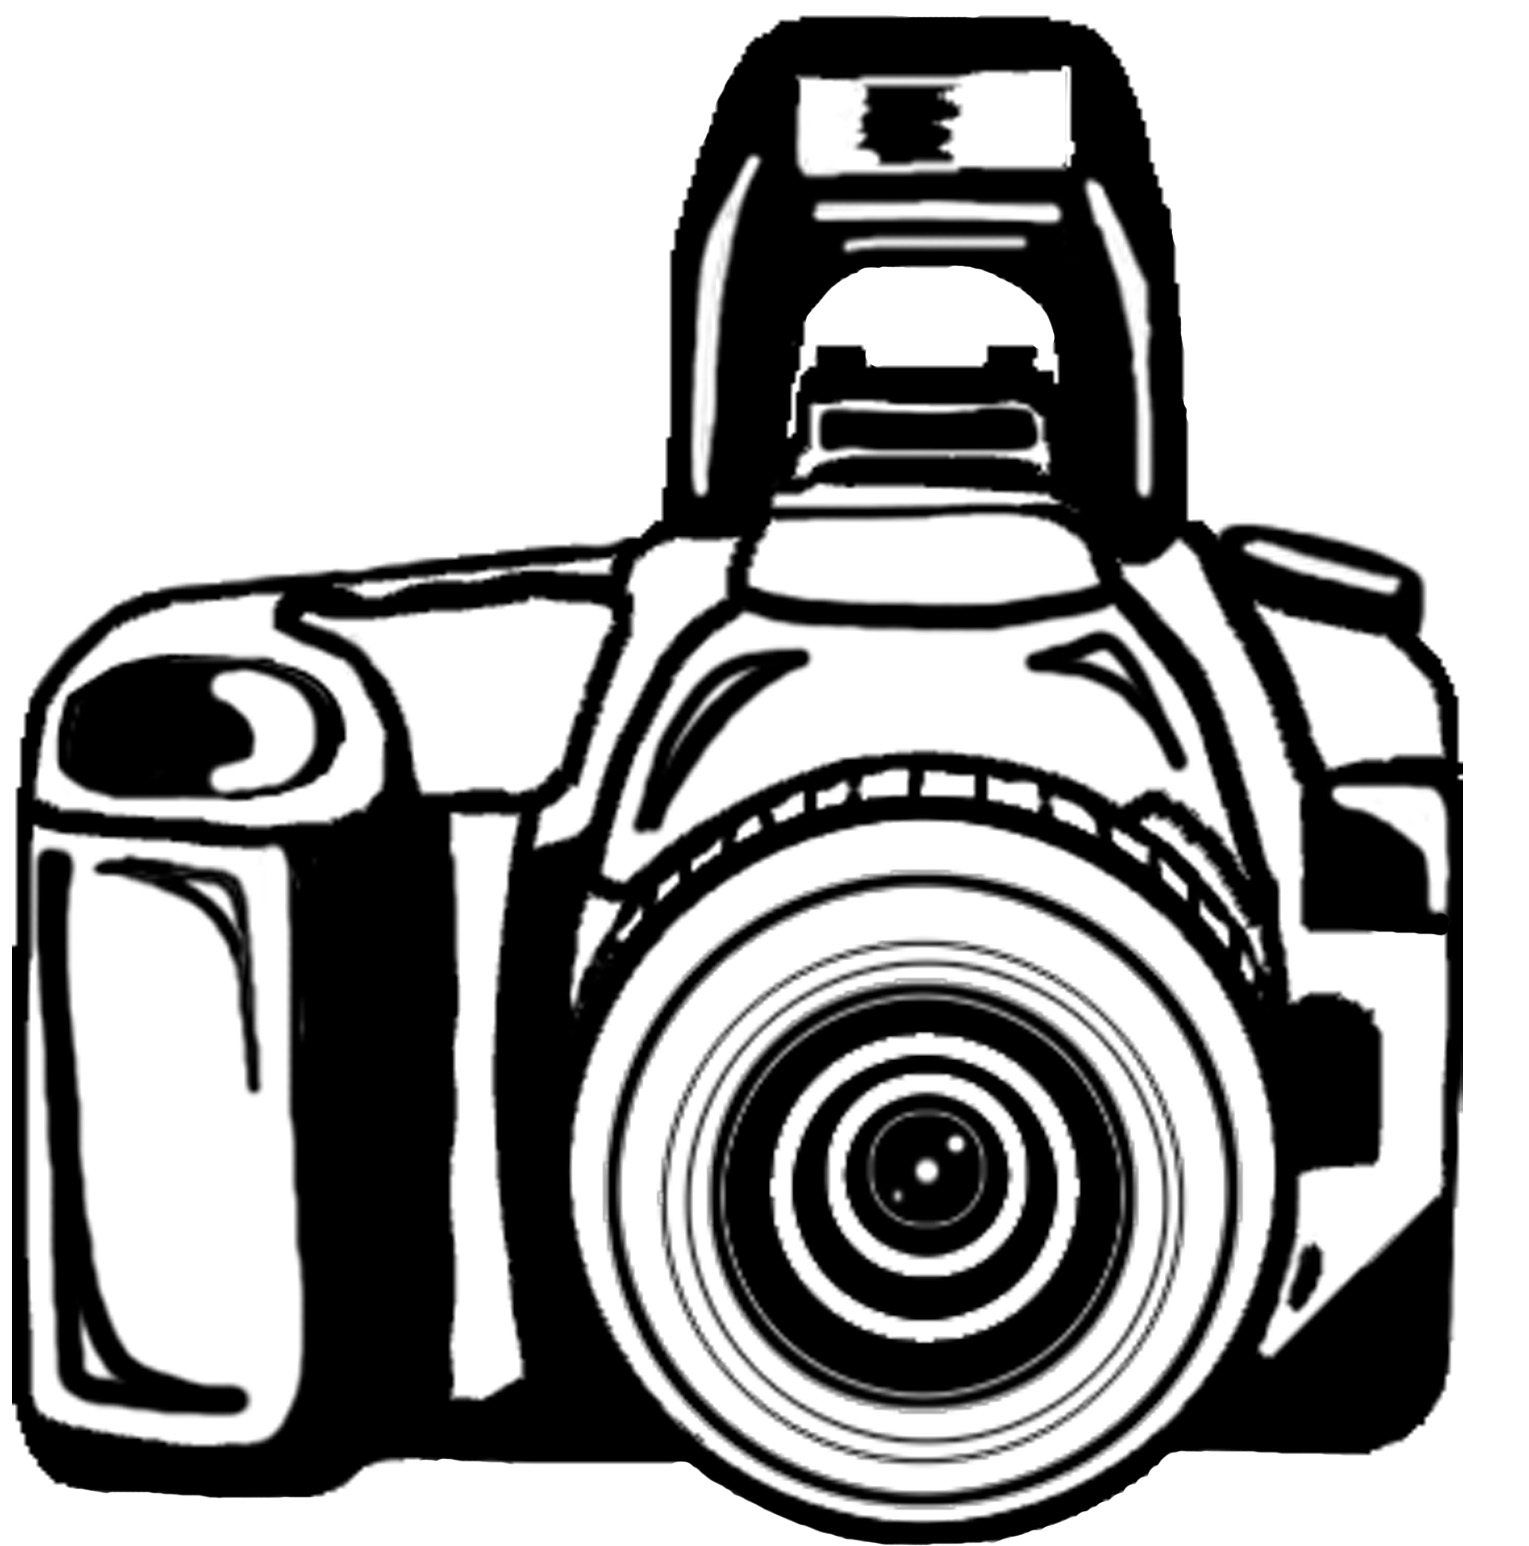 clipart web camera - photo #45